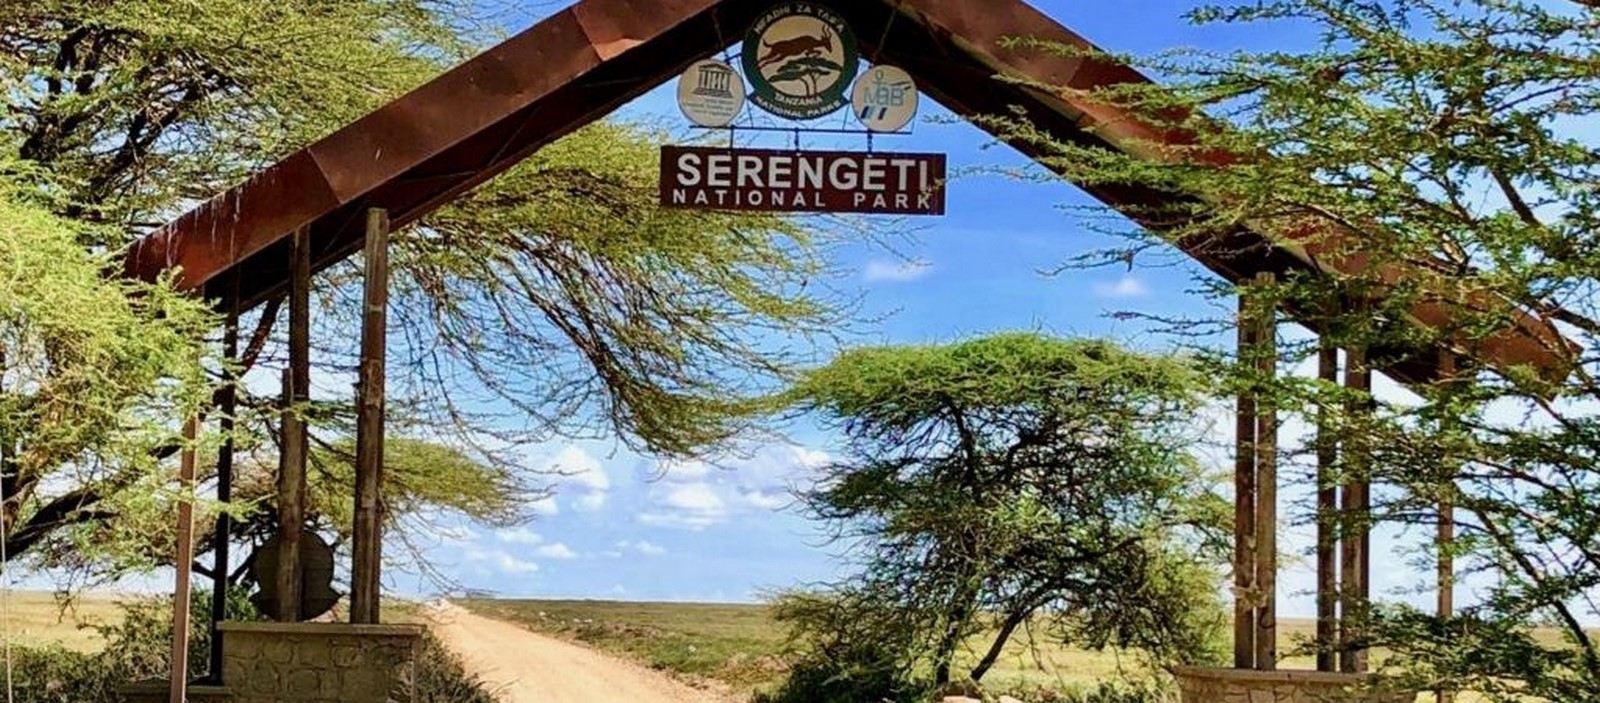 Serengeti National Park, Tanzania. - Sheet2